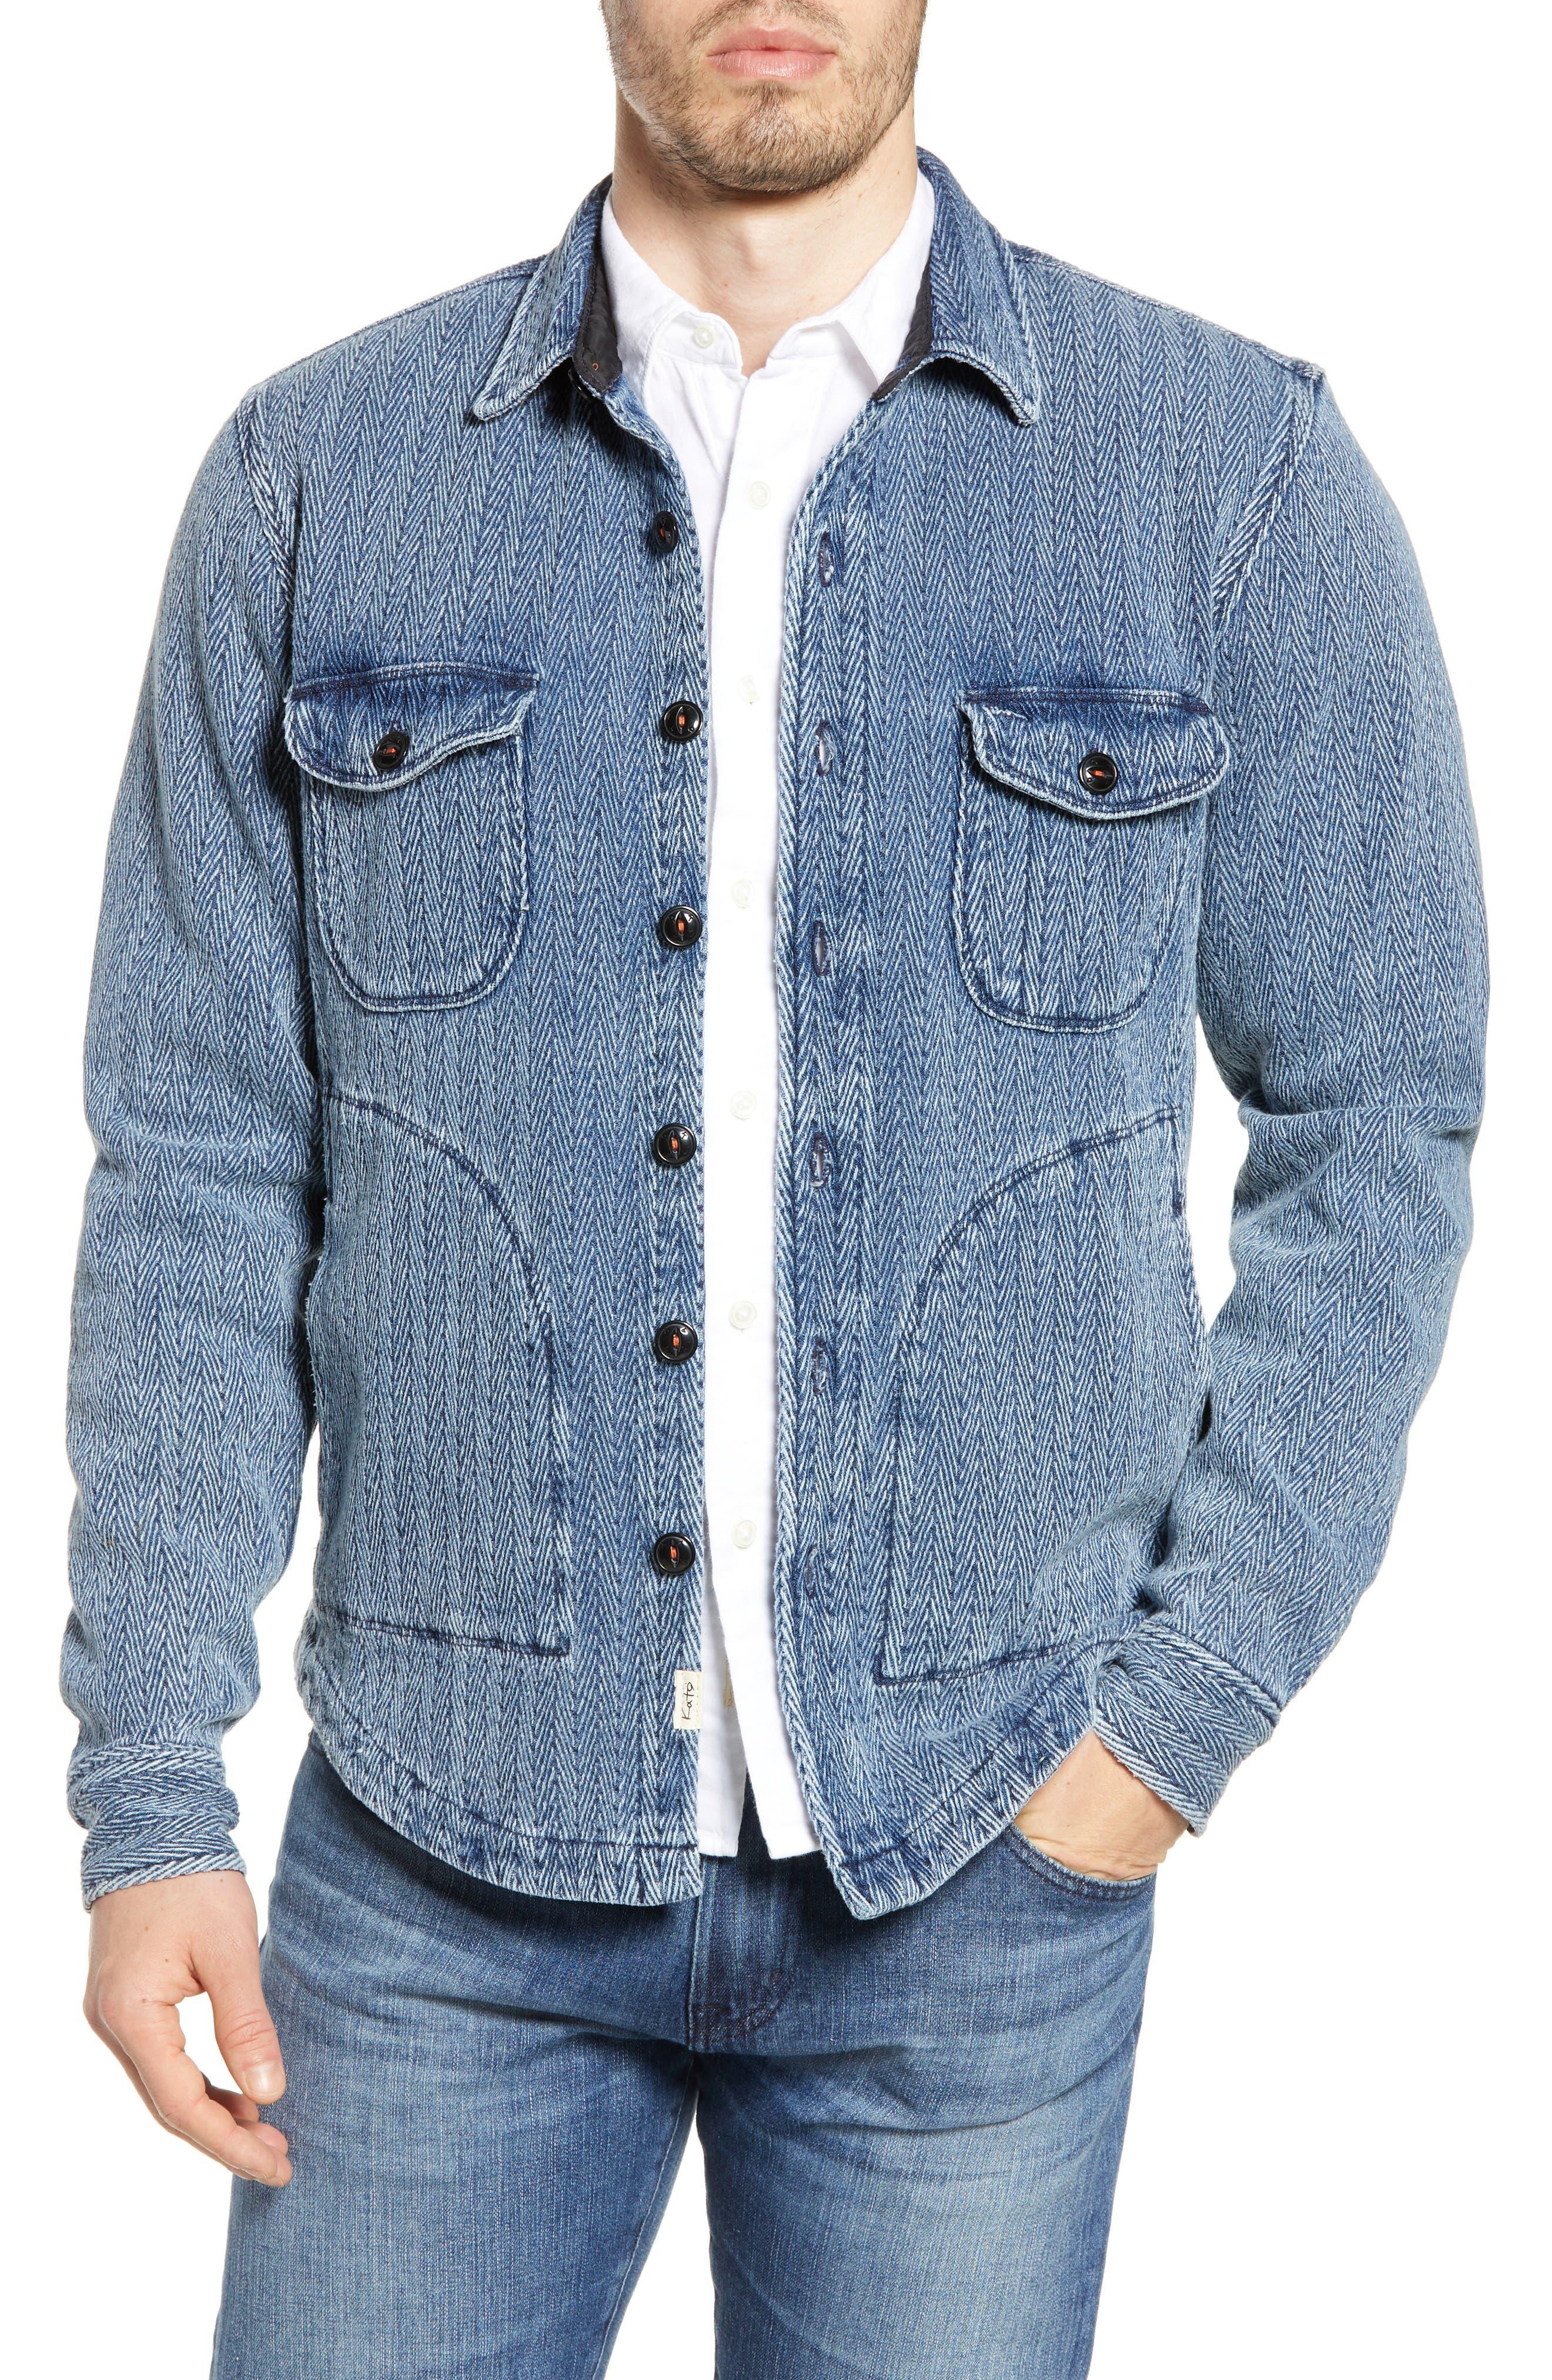 Edwardian Men's Fashion & Clothing 1900-1910s Mens Kato The Anvil Herringbone Shirt Jacket $358.00 AT vintagedancer.com